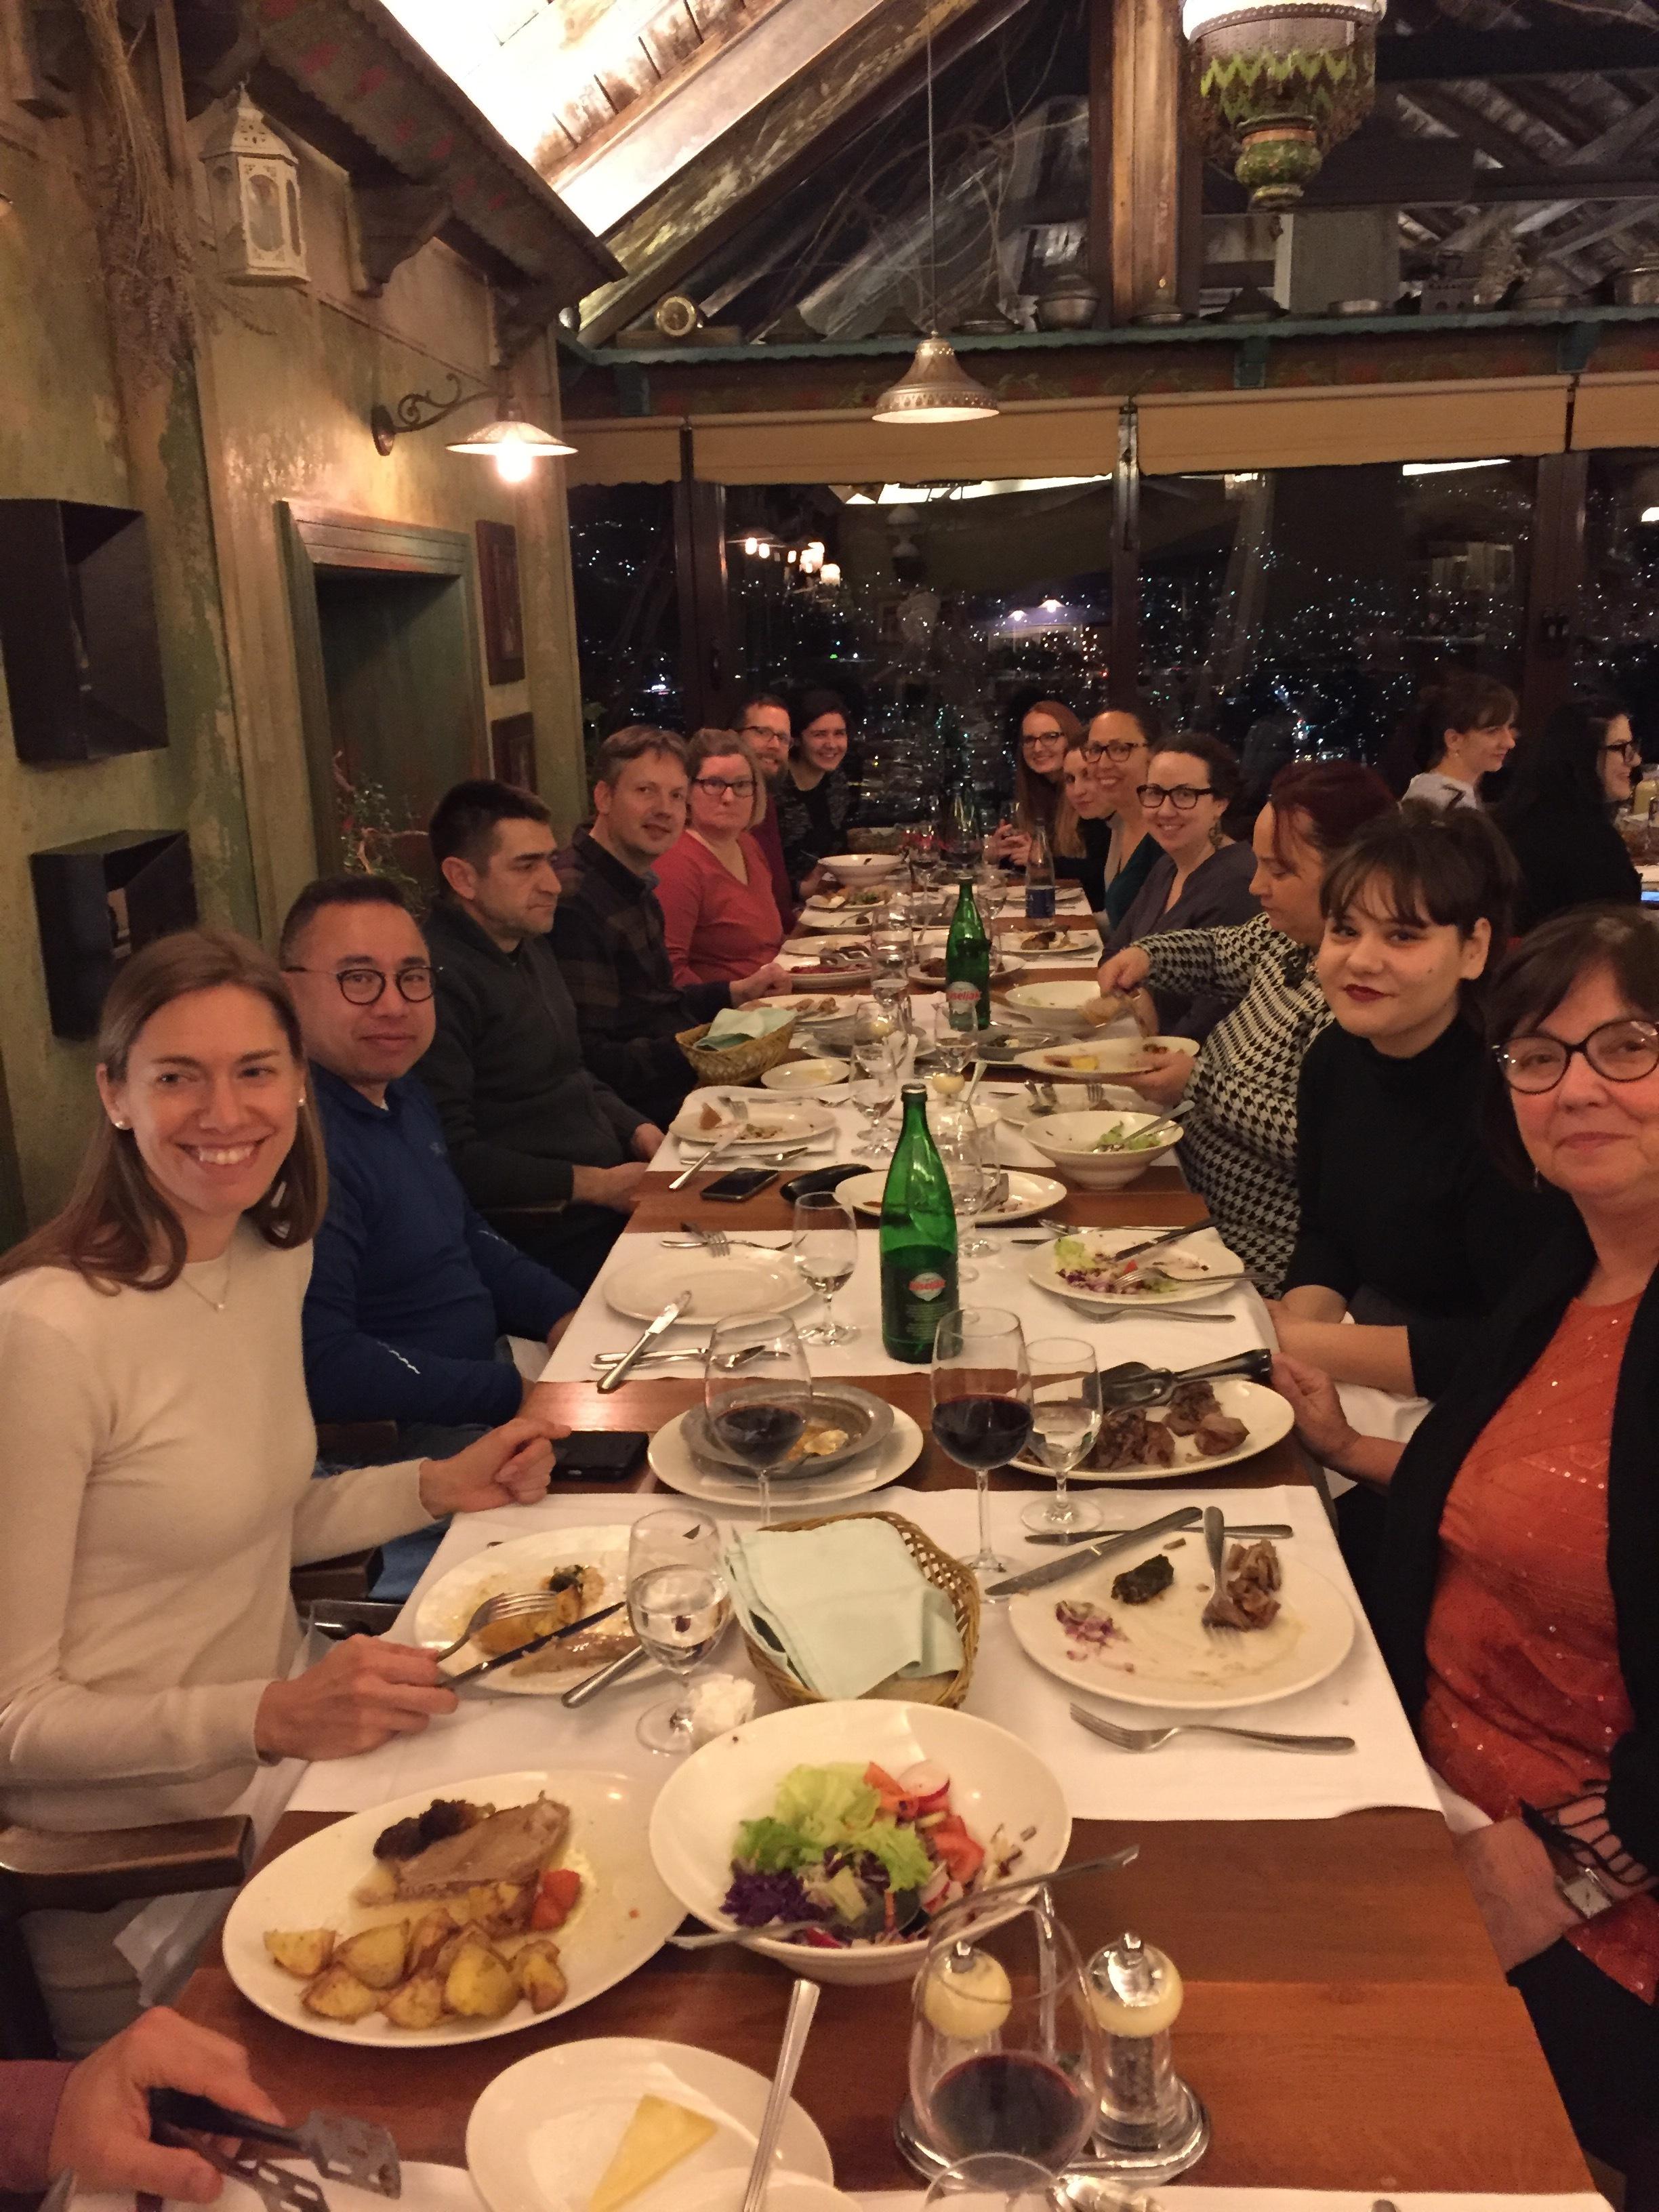 A crowd favorite is always dinner at Kibe's overlooking Sarajevo